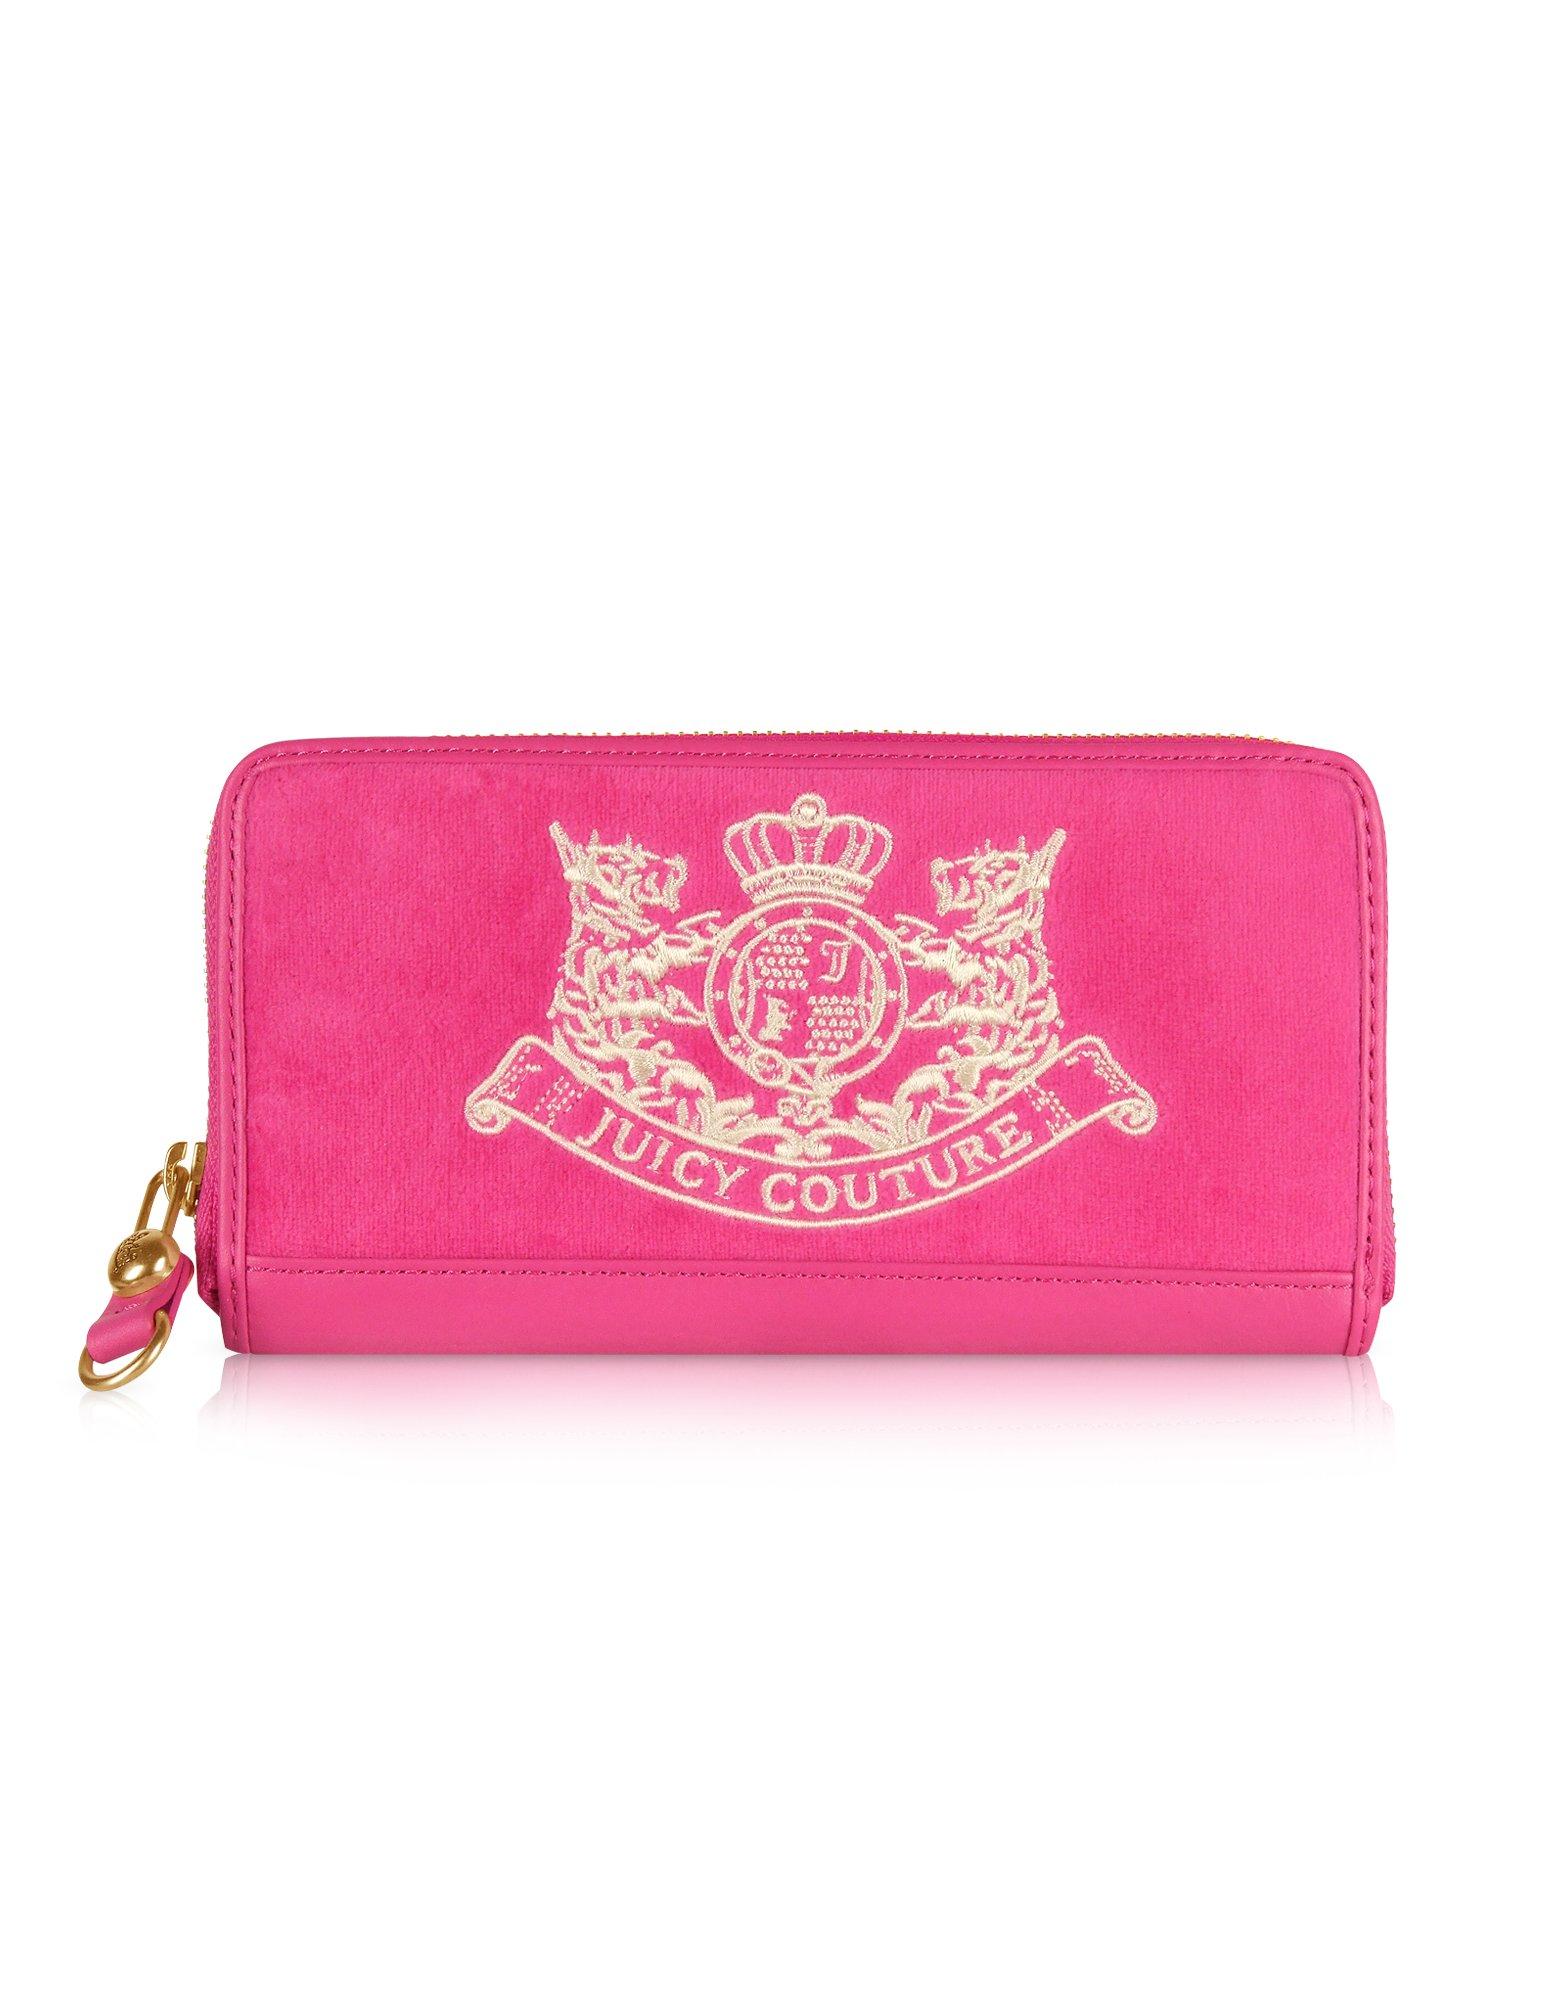 Juicy Couture Handbags Pink - Foto Handbag All Collections ... f46a61027b7f2